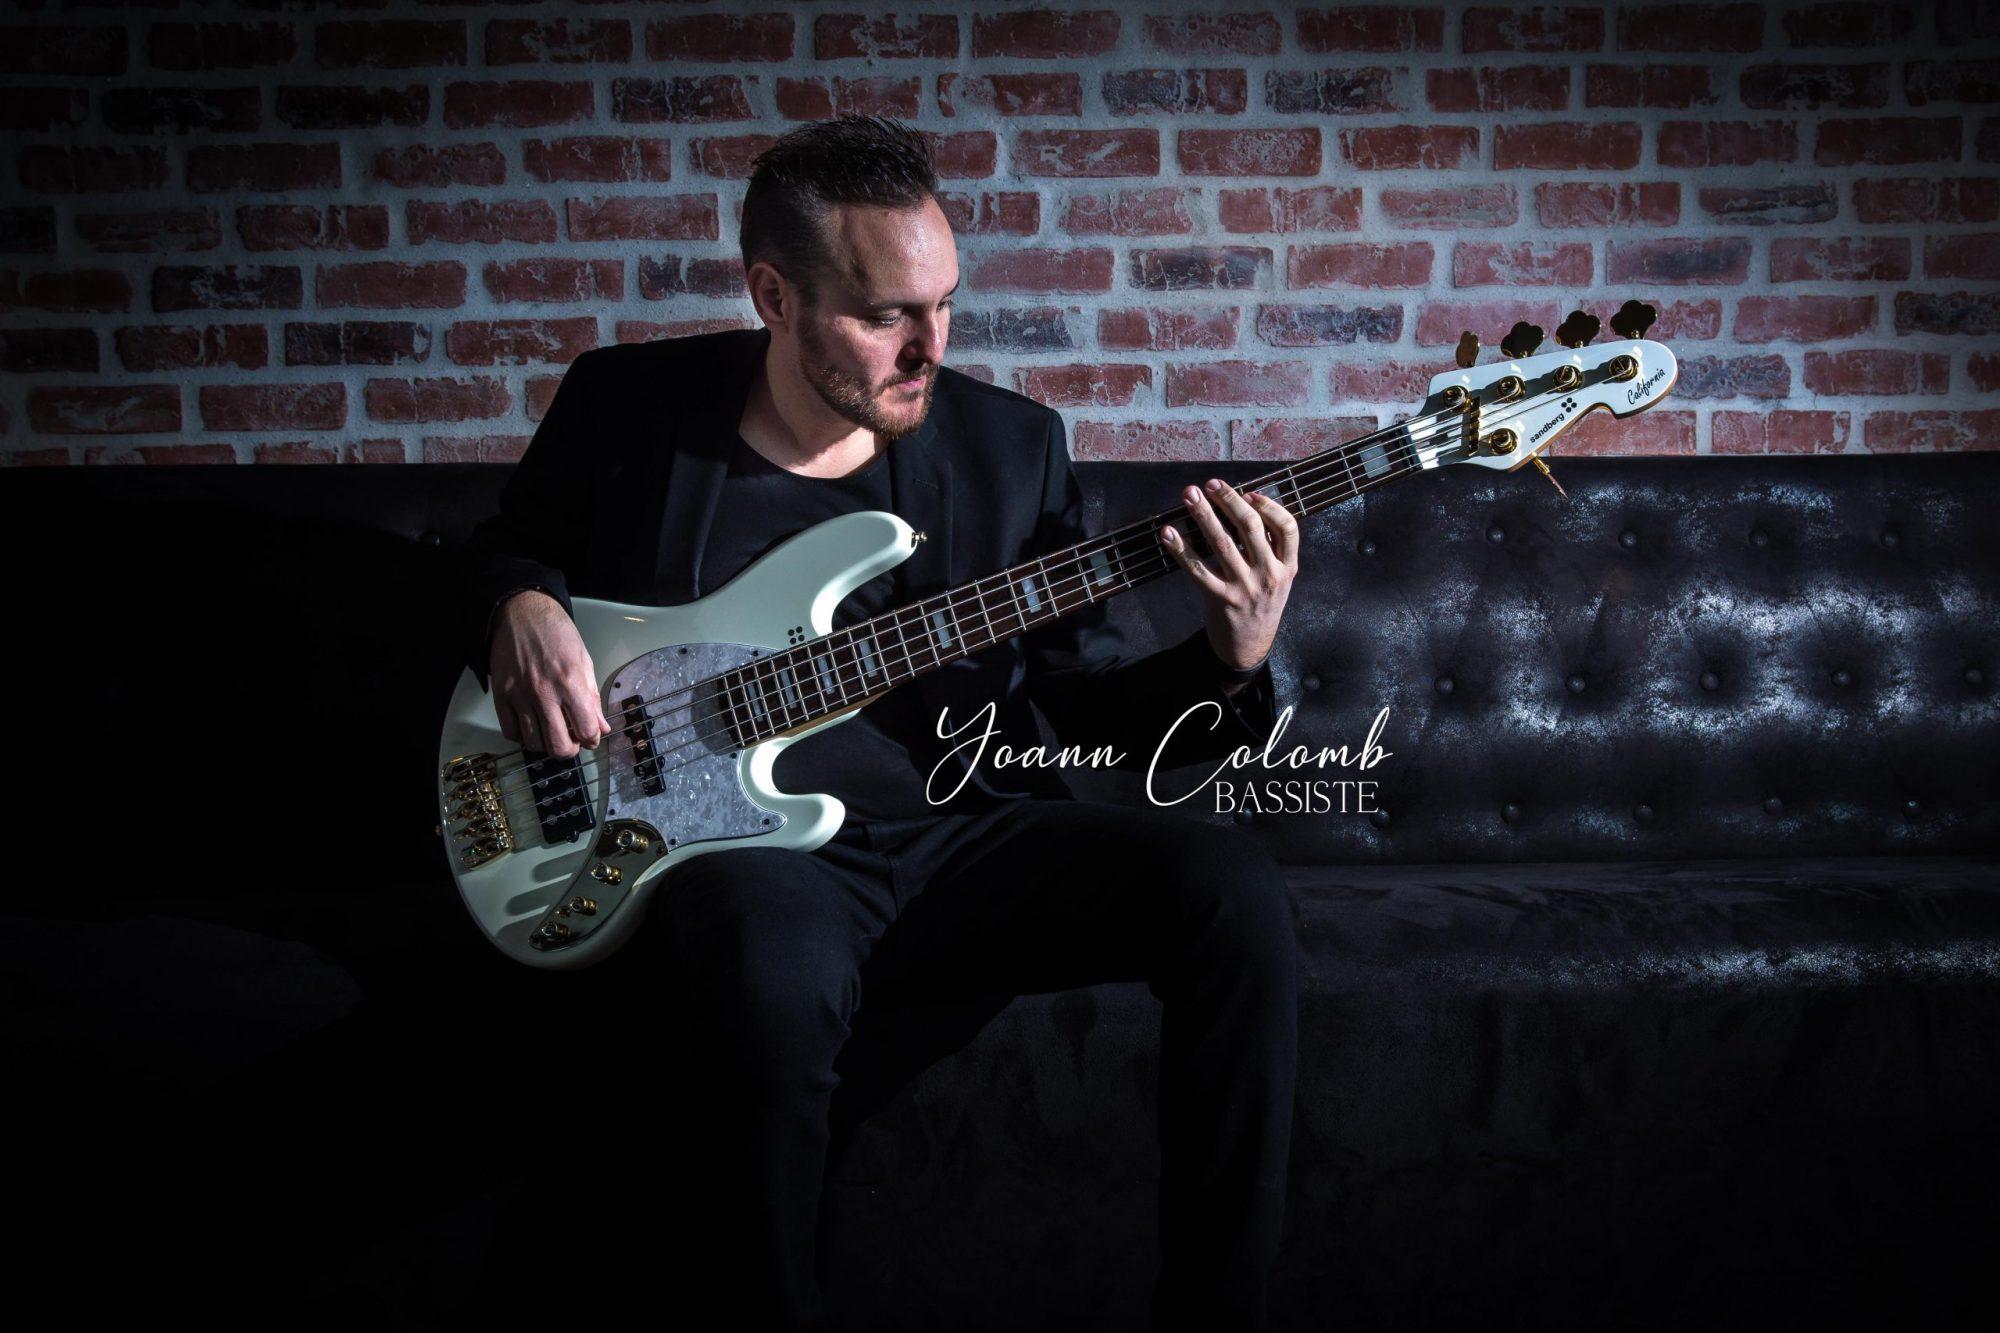 Yoann Colomb - bassiste